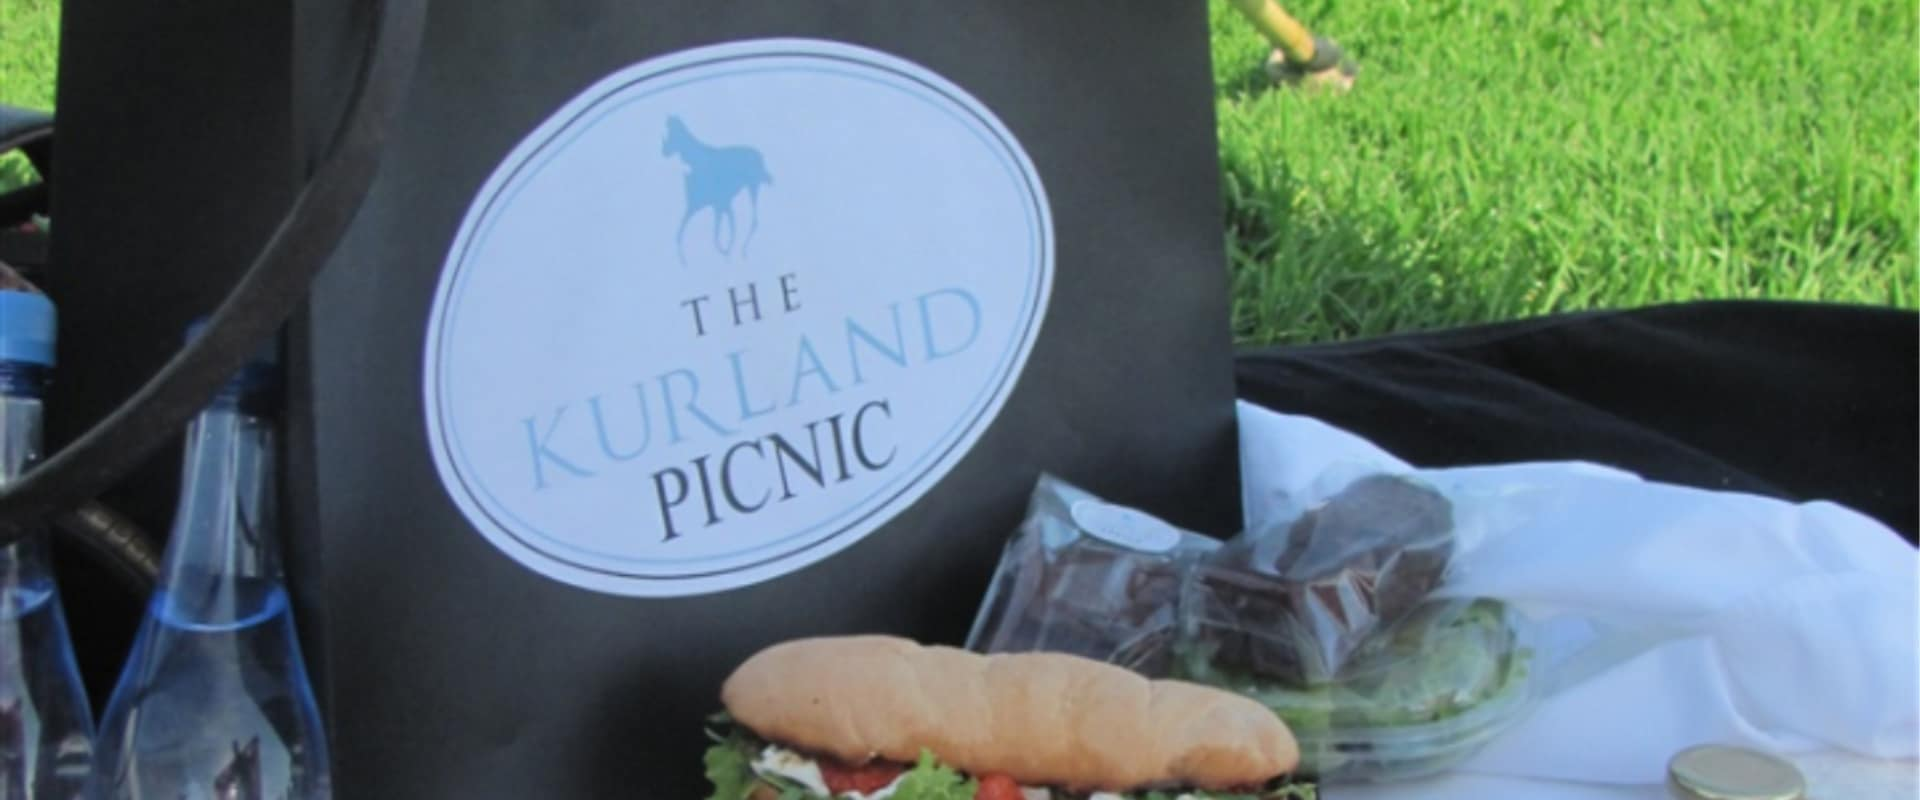 Family picnics on the beautiful estate